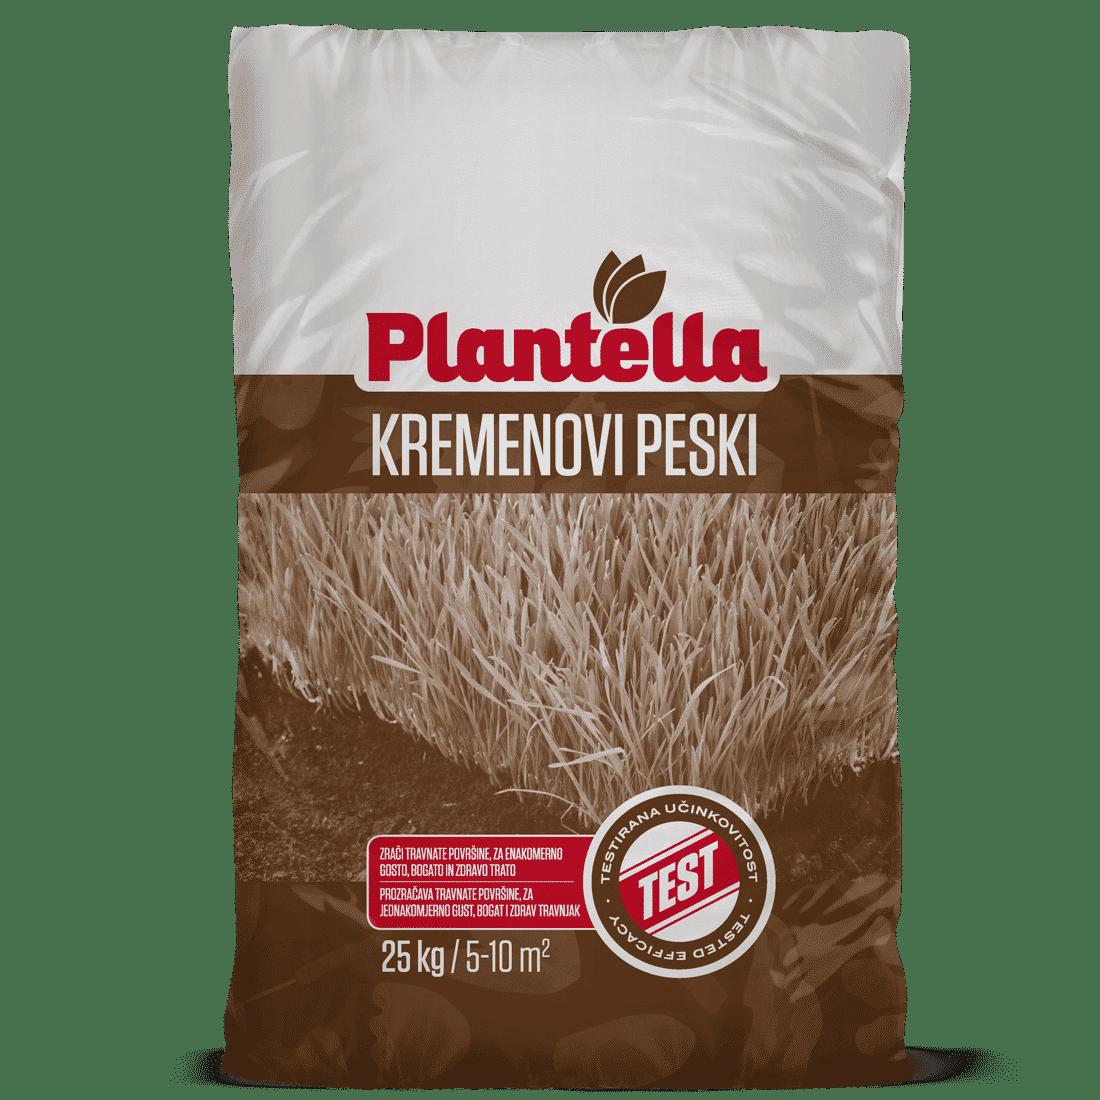 Plantella_Kremenovi-peski_25kg_SI-HR